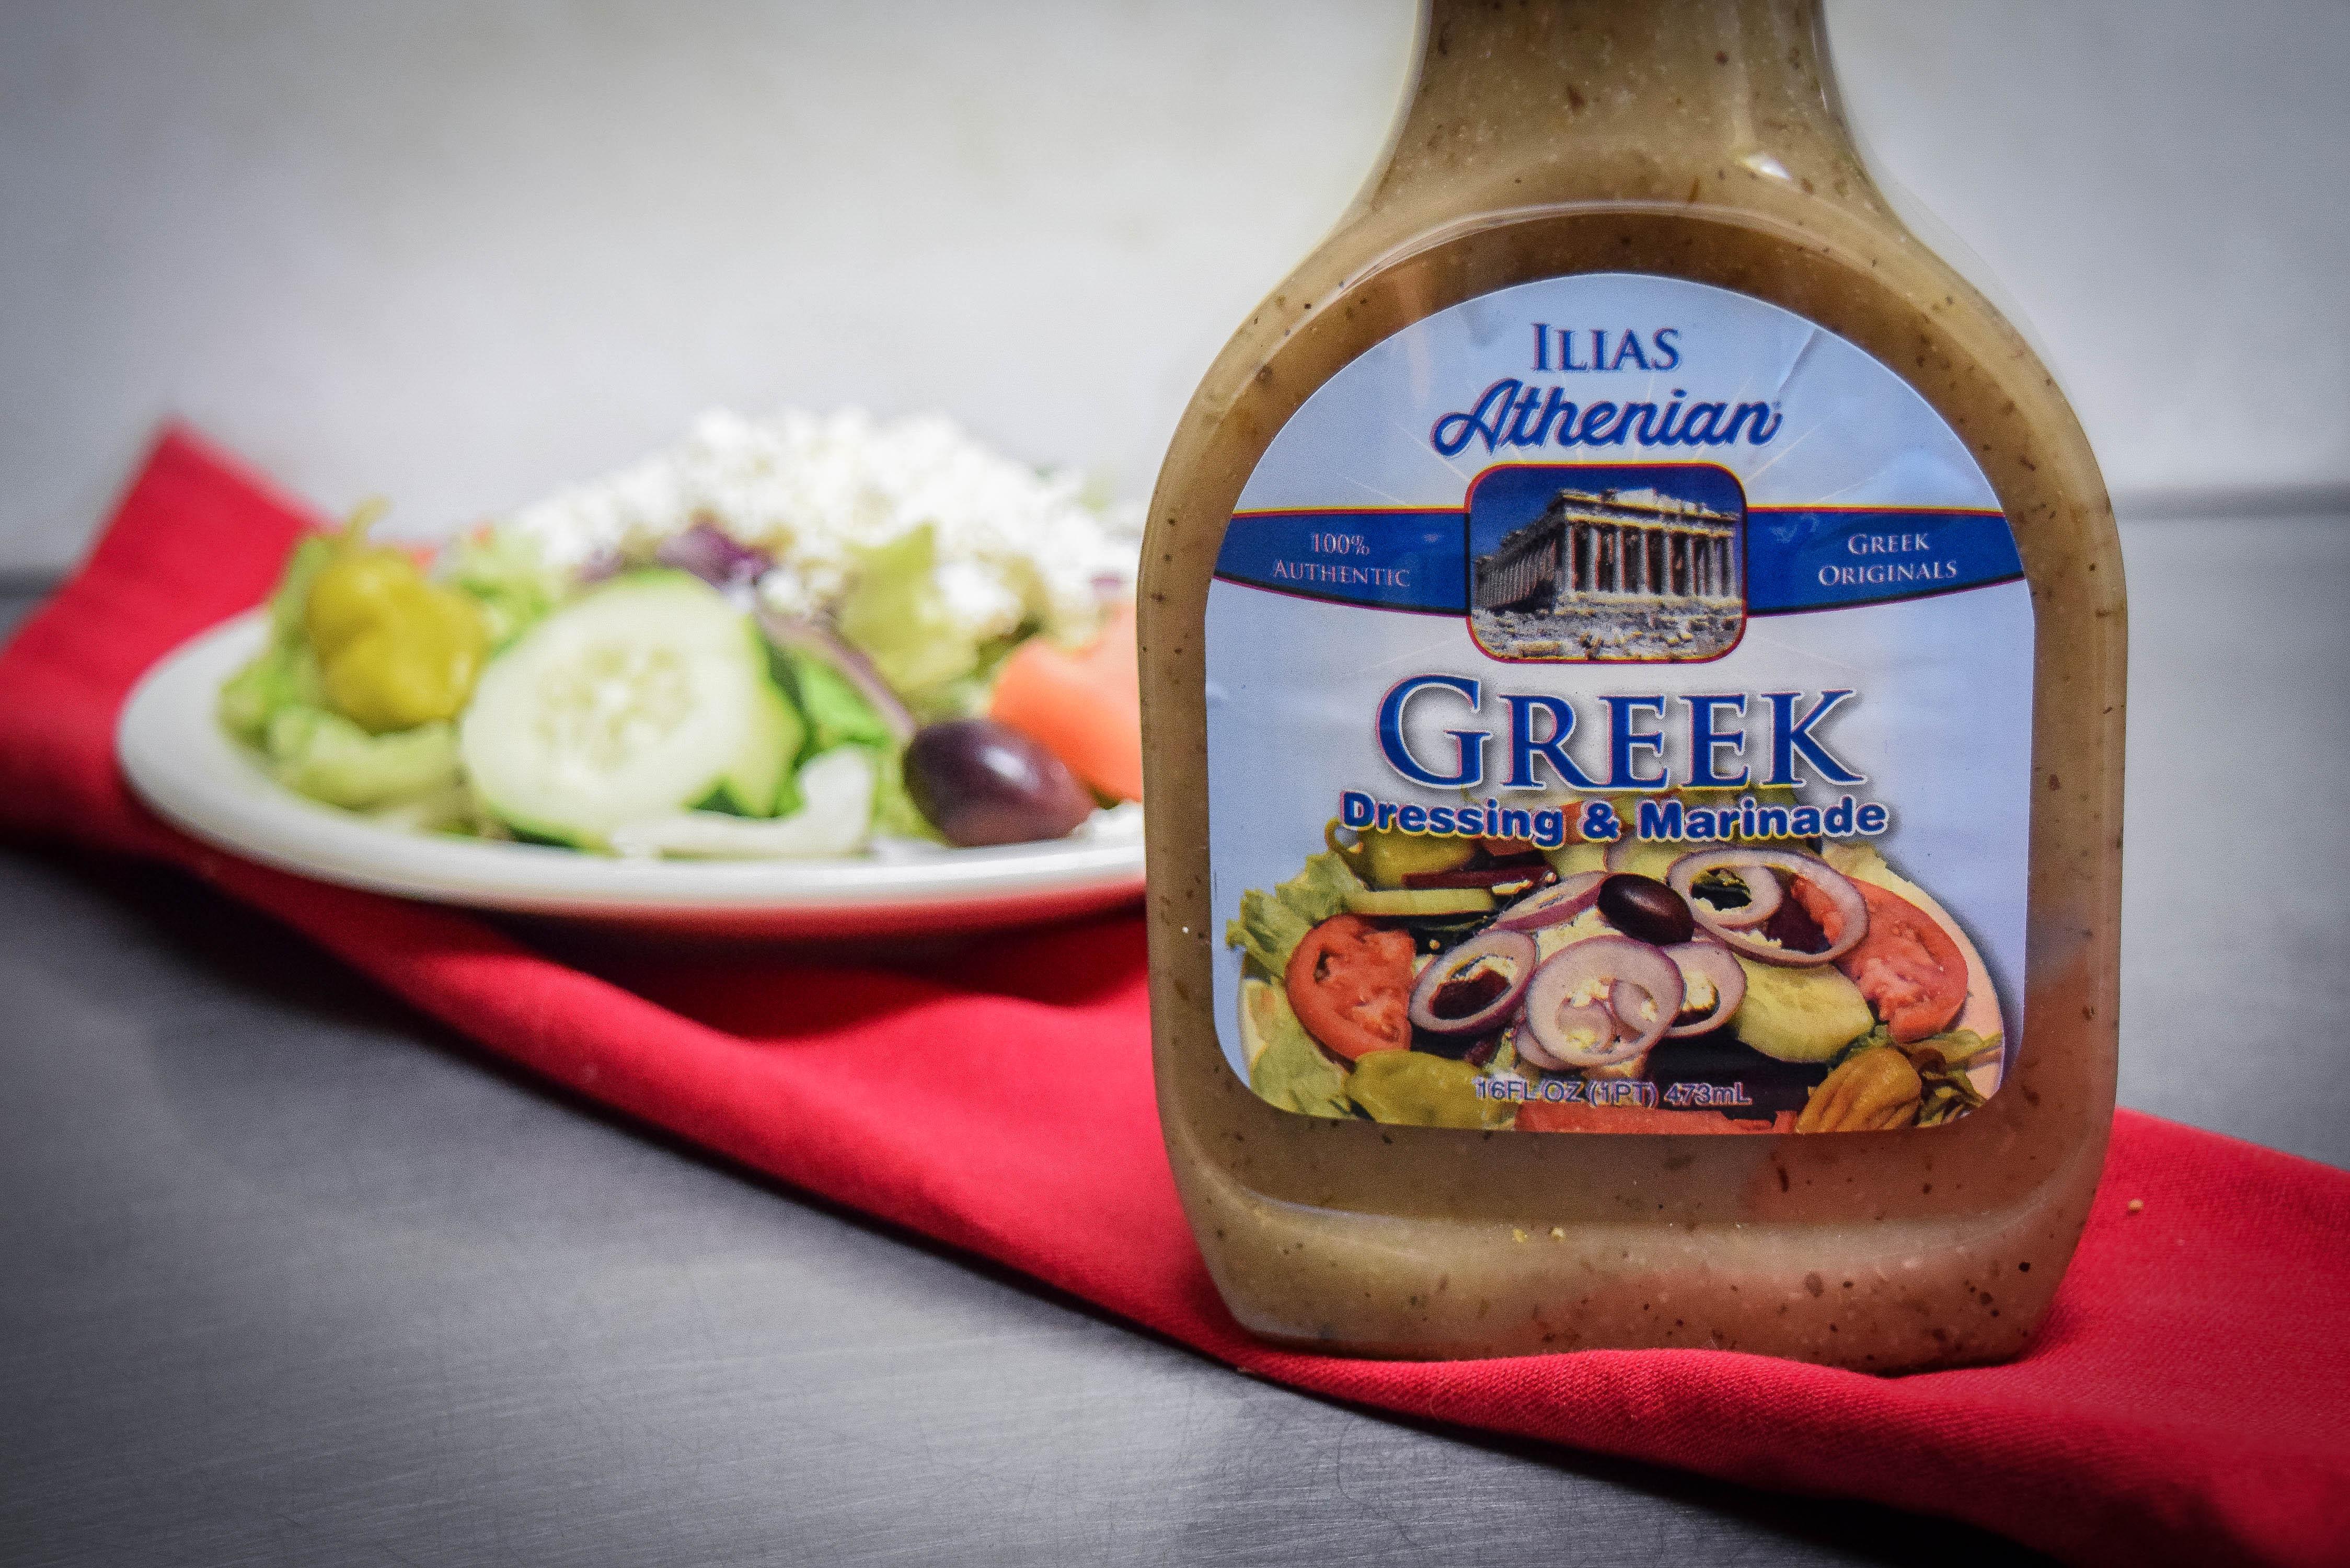 Athenian Greek Dressing